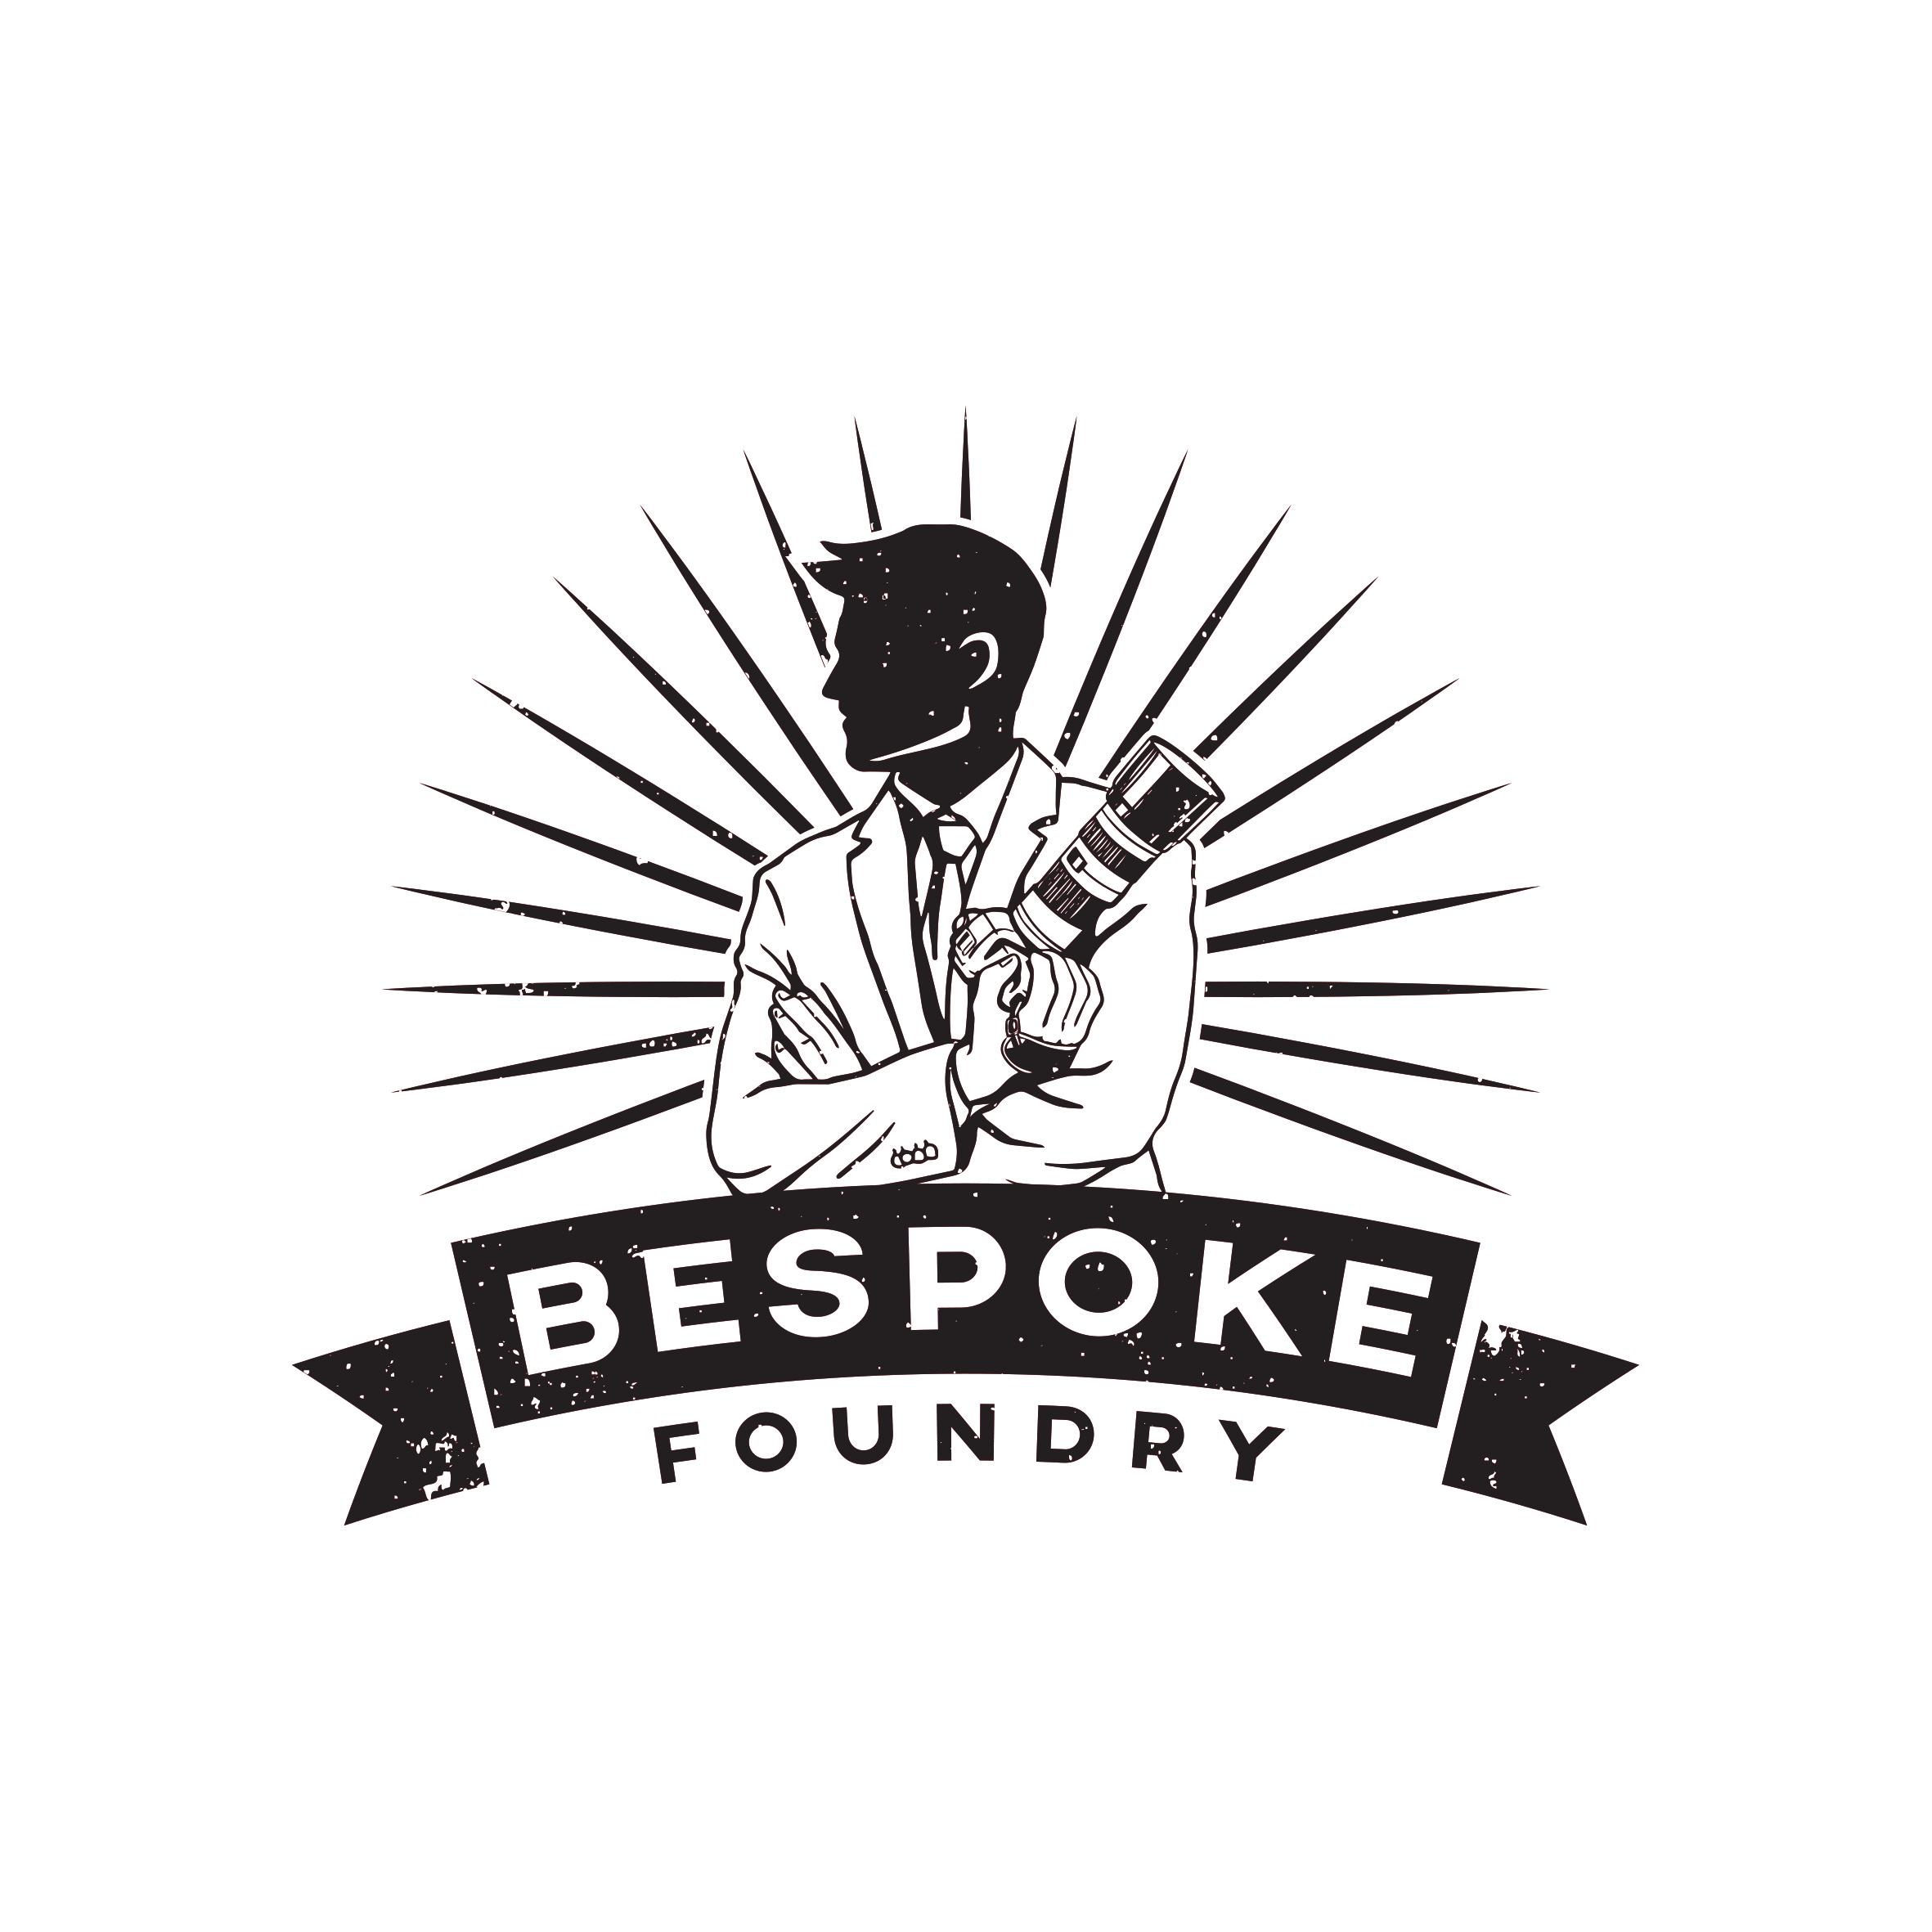 Bespoke Foundry